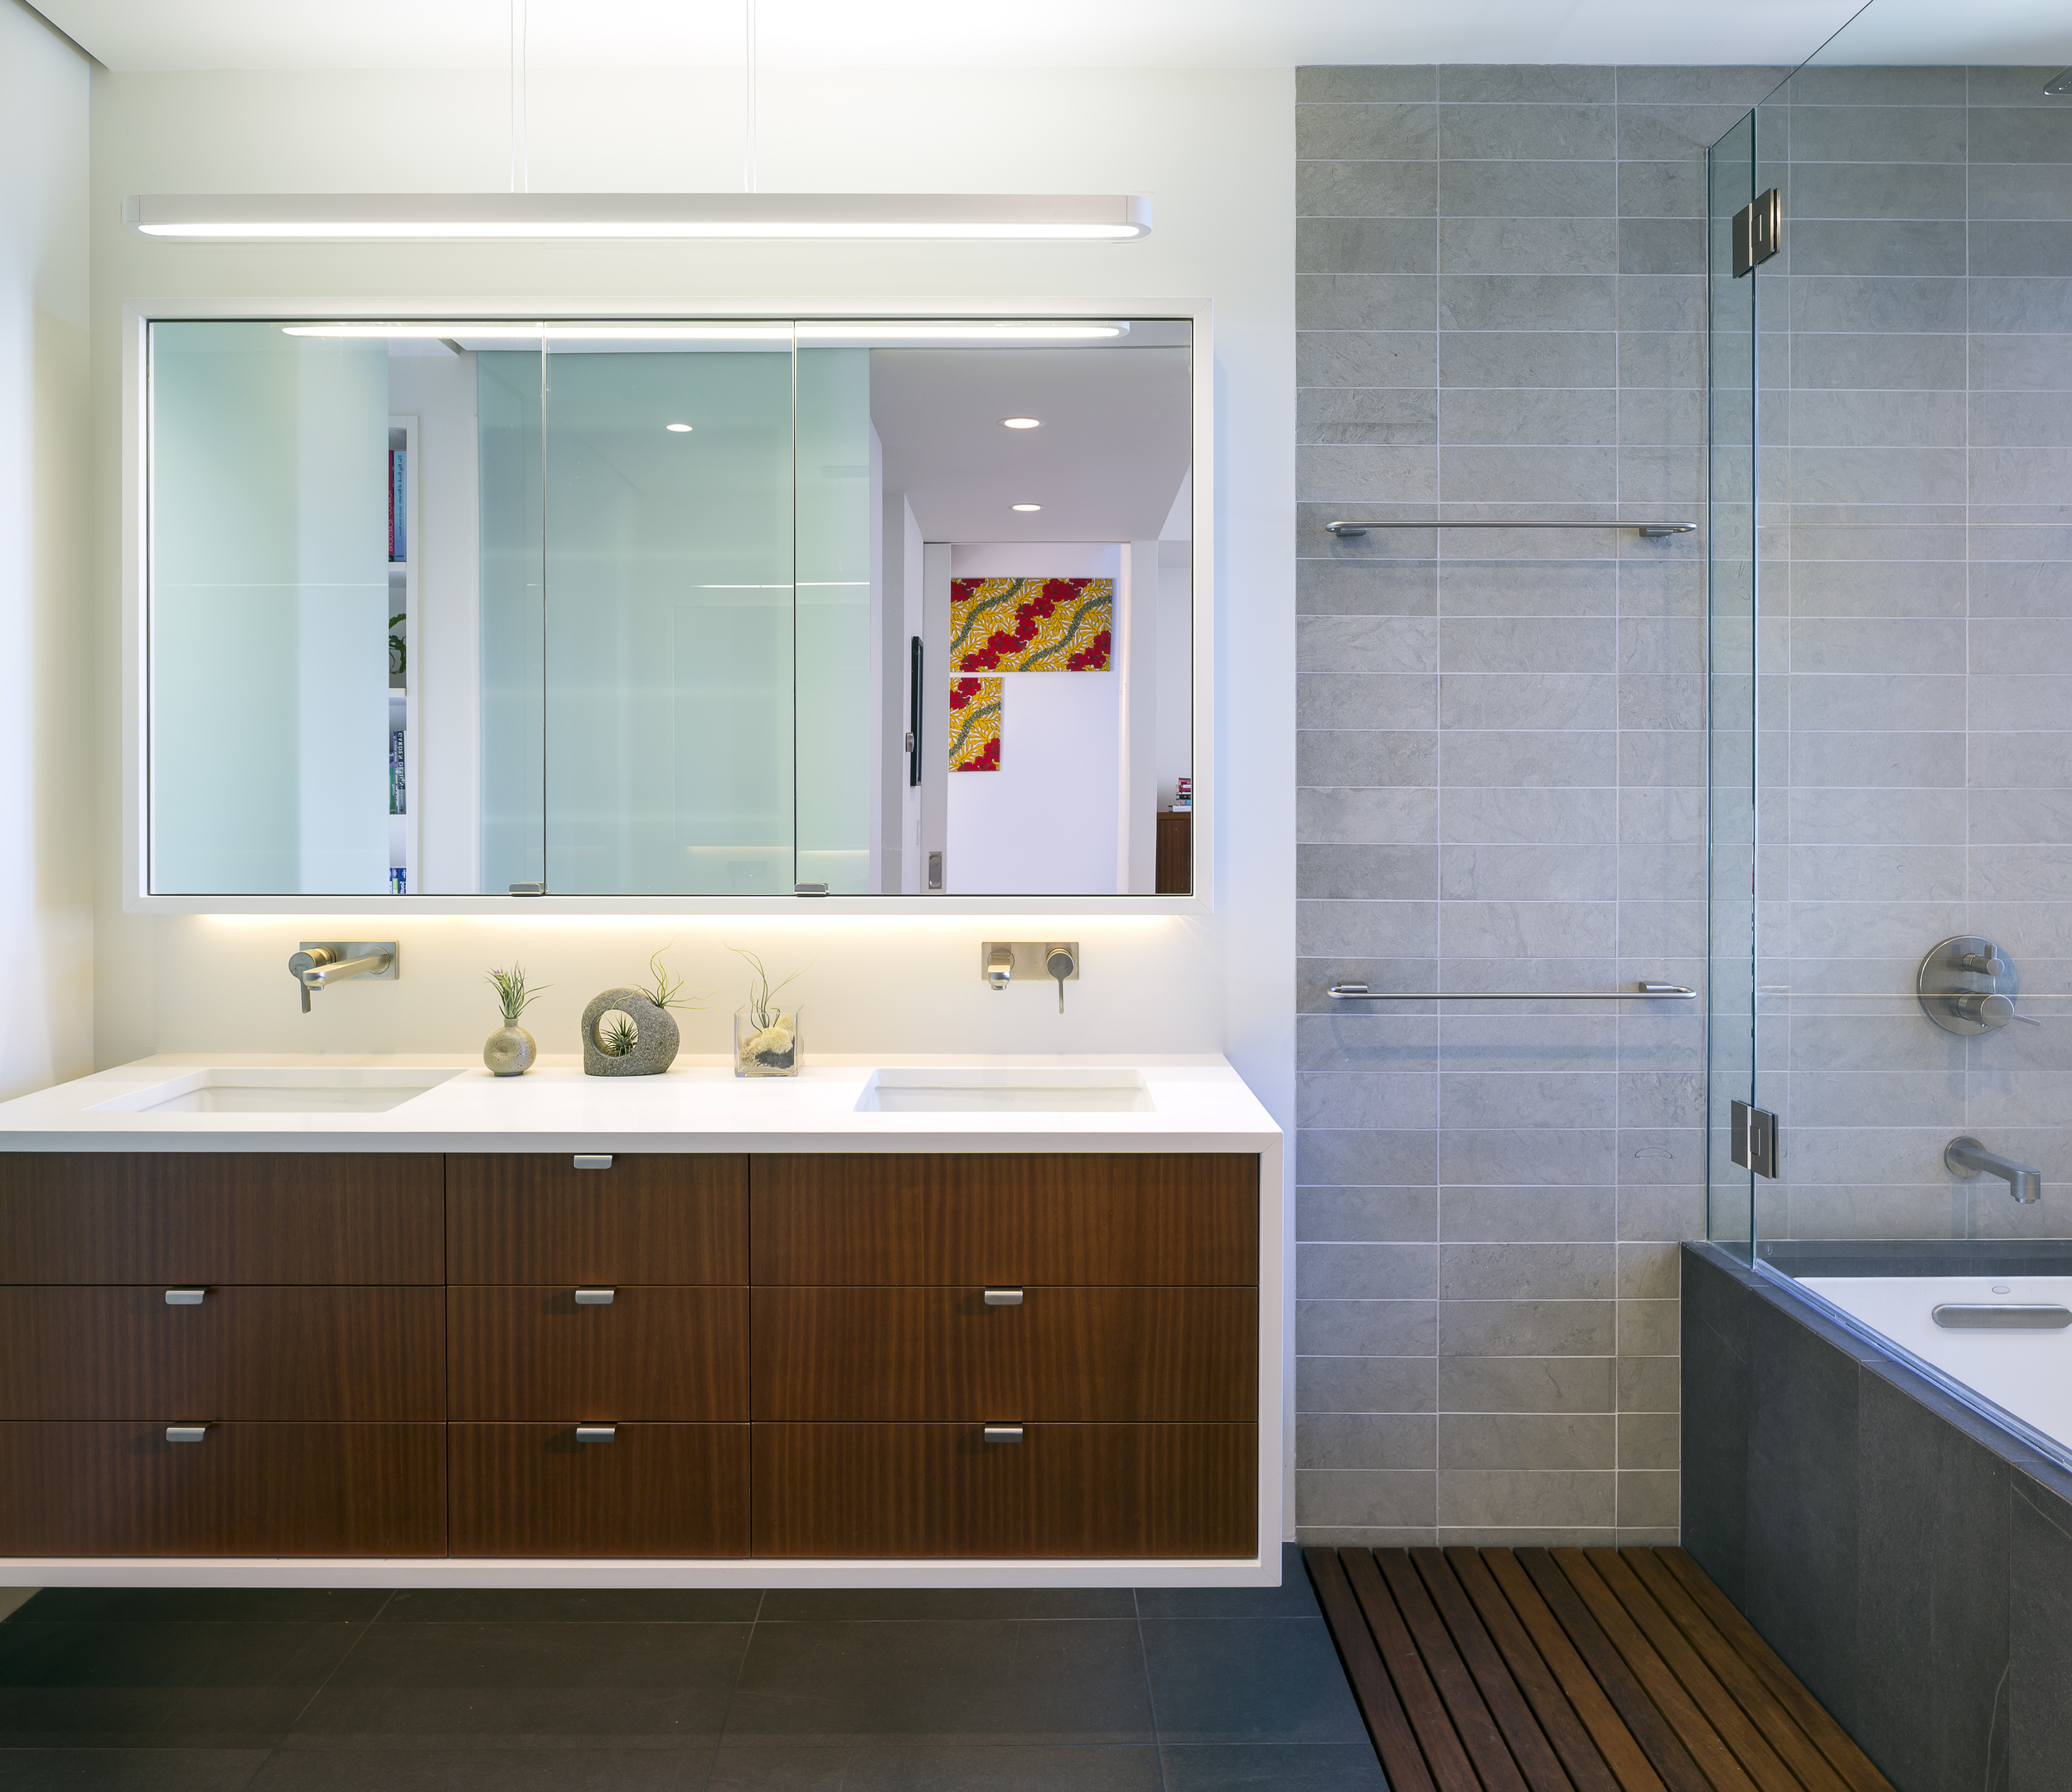 rutledge st residence - master bedroom suite